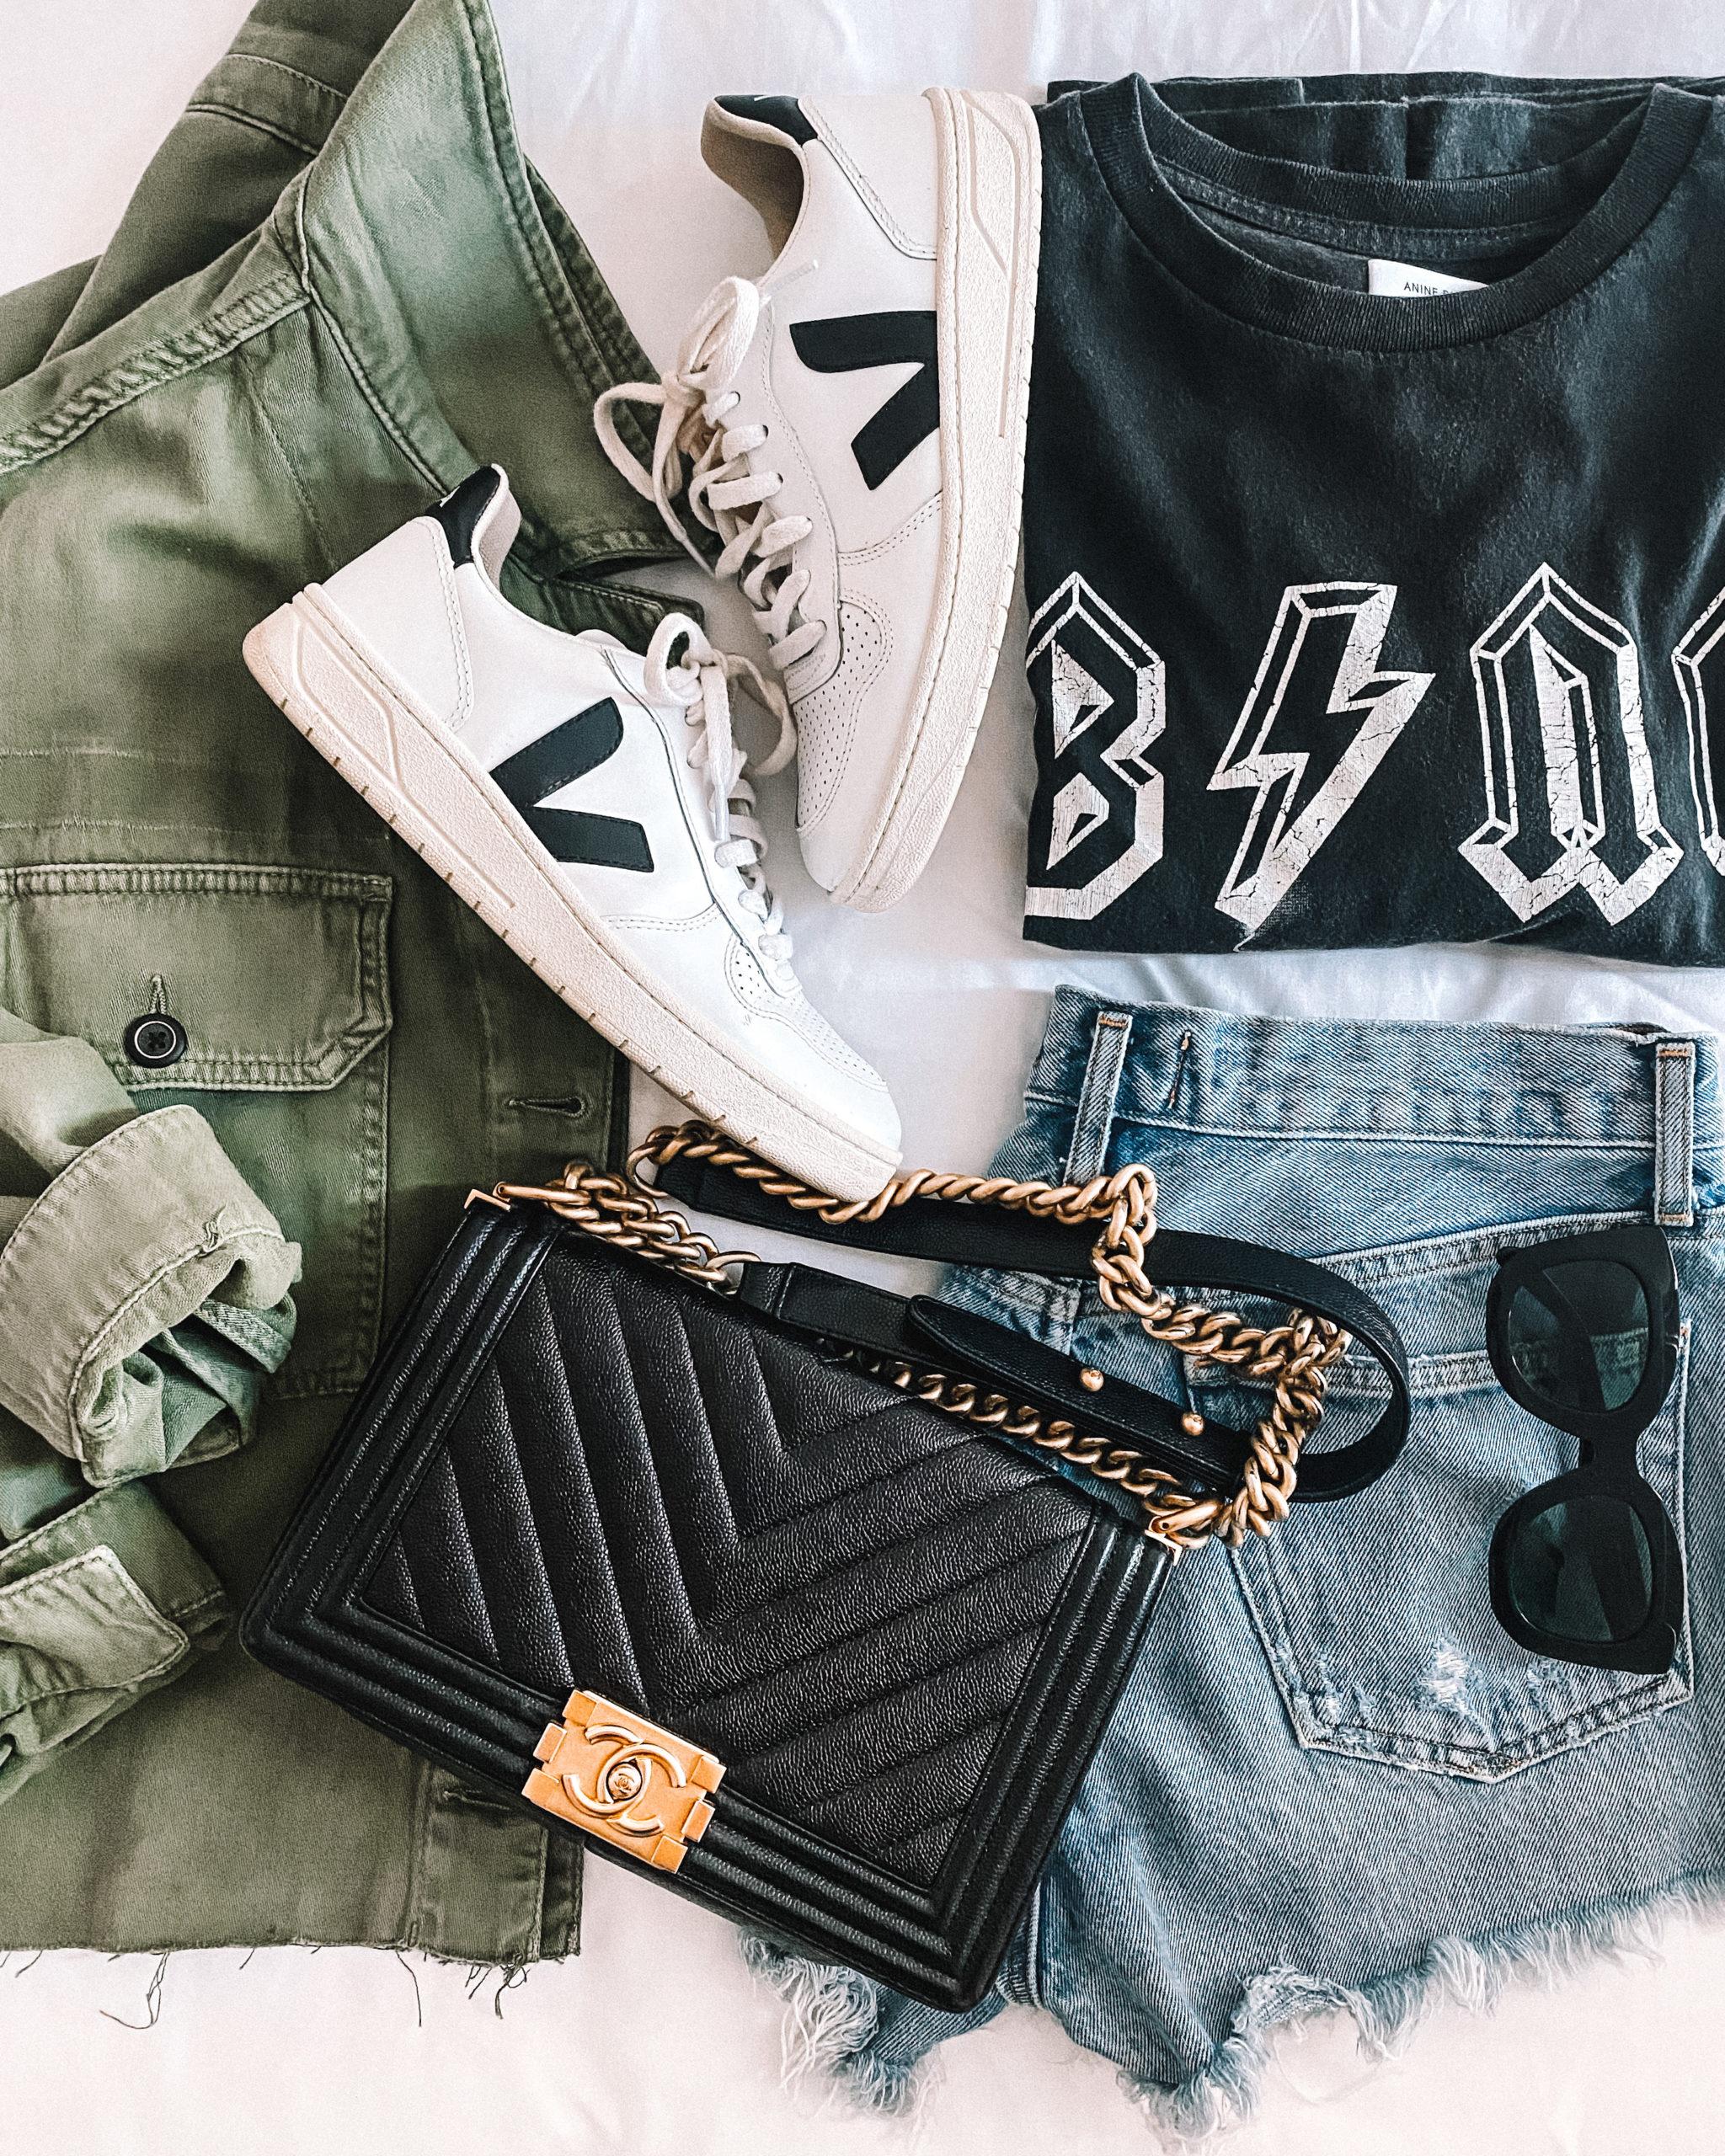 Fashion jakson anine bing tshirt ripped jeans veja sneakers chanel boy bag